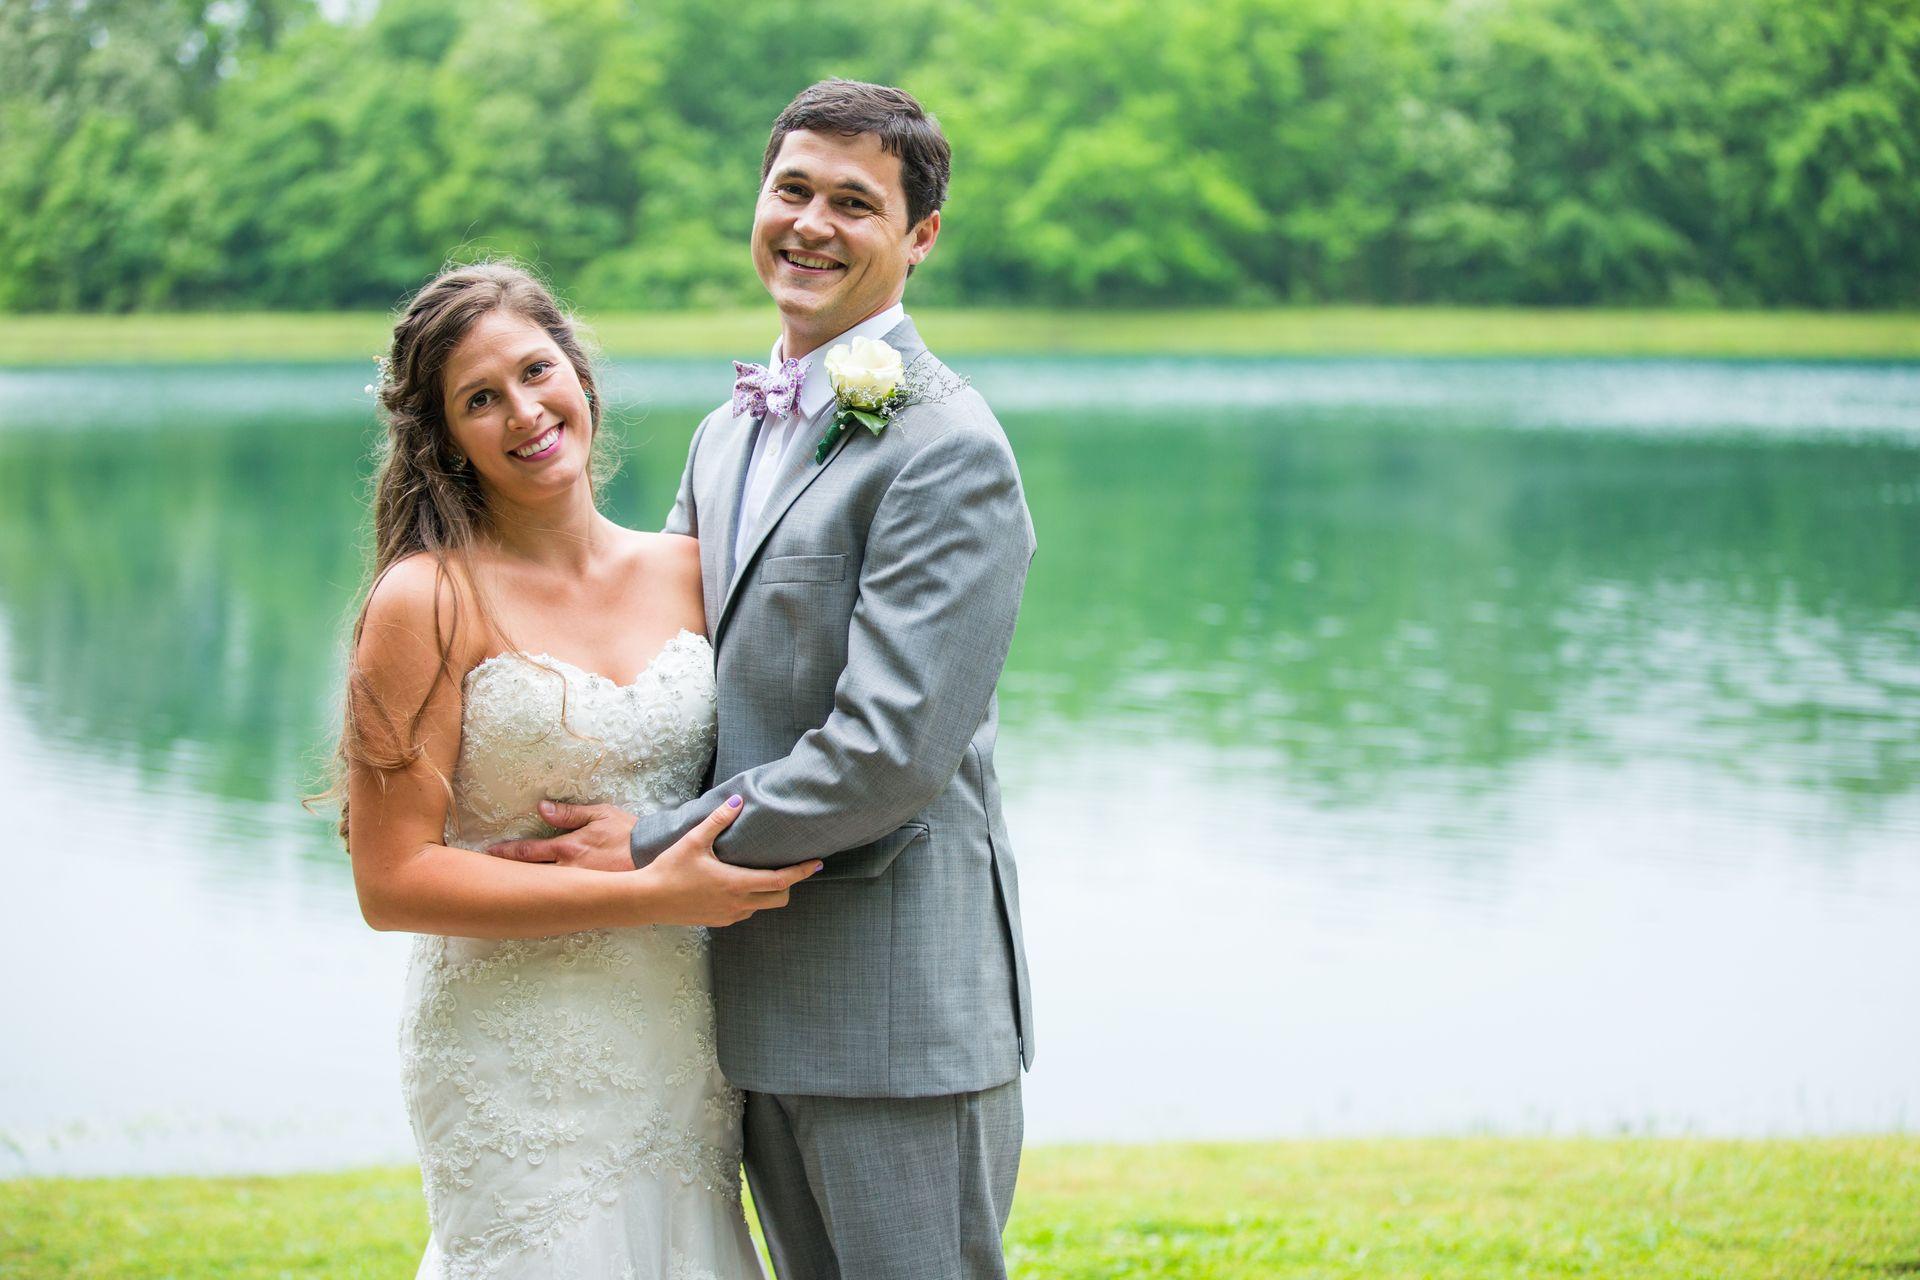 Traditional spring wedding at a park lakeland tn